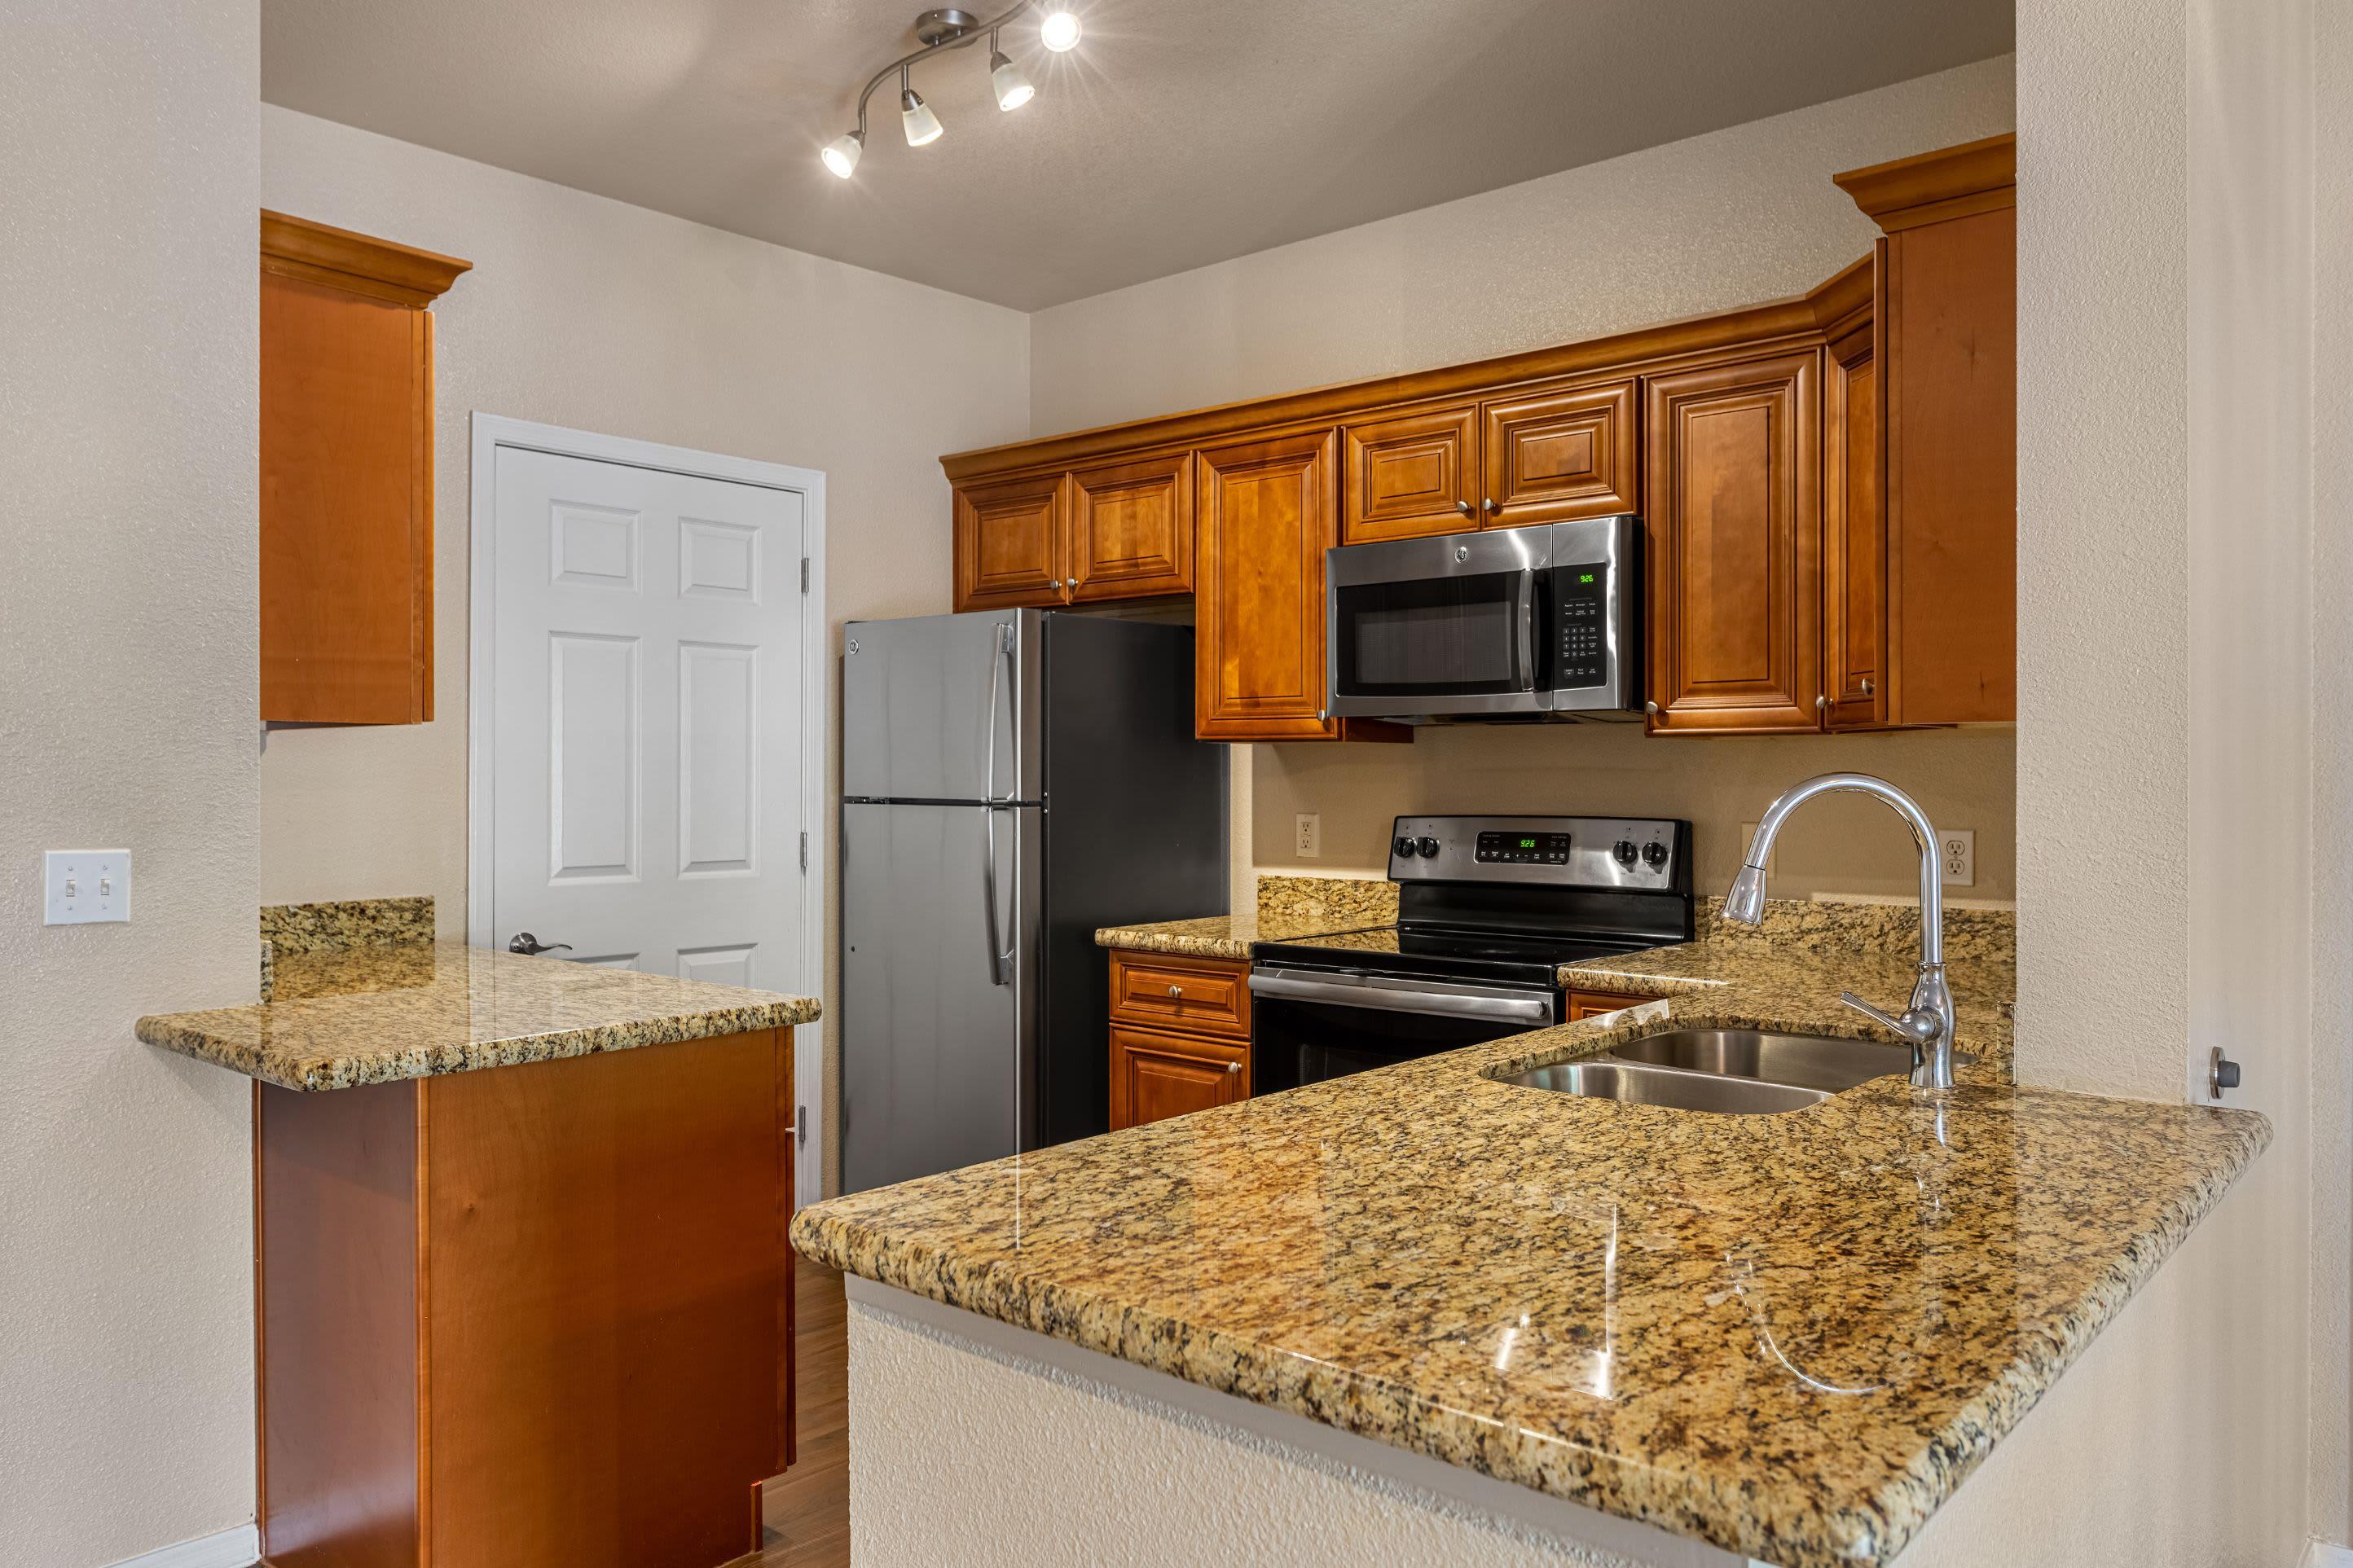 Bright kitchen with modern appliances Azure Creek in Cave Creek, Arizona